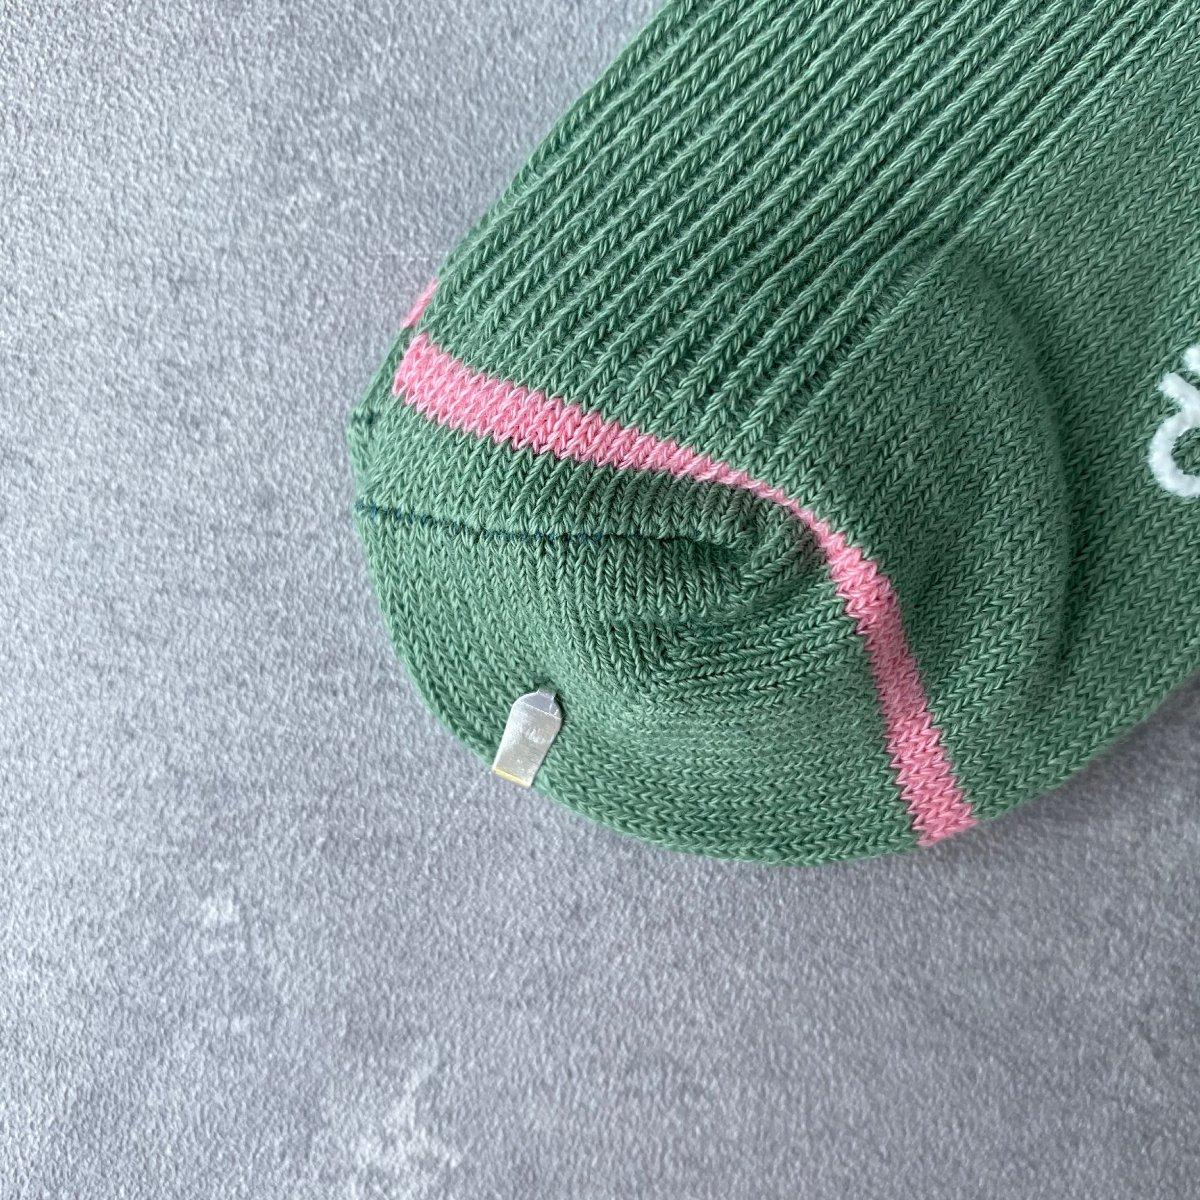 【BABY】Dino Socks 詳細画像15